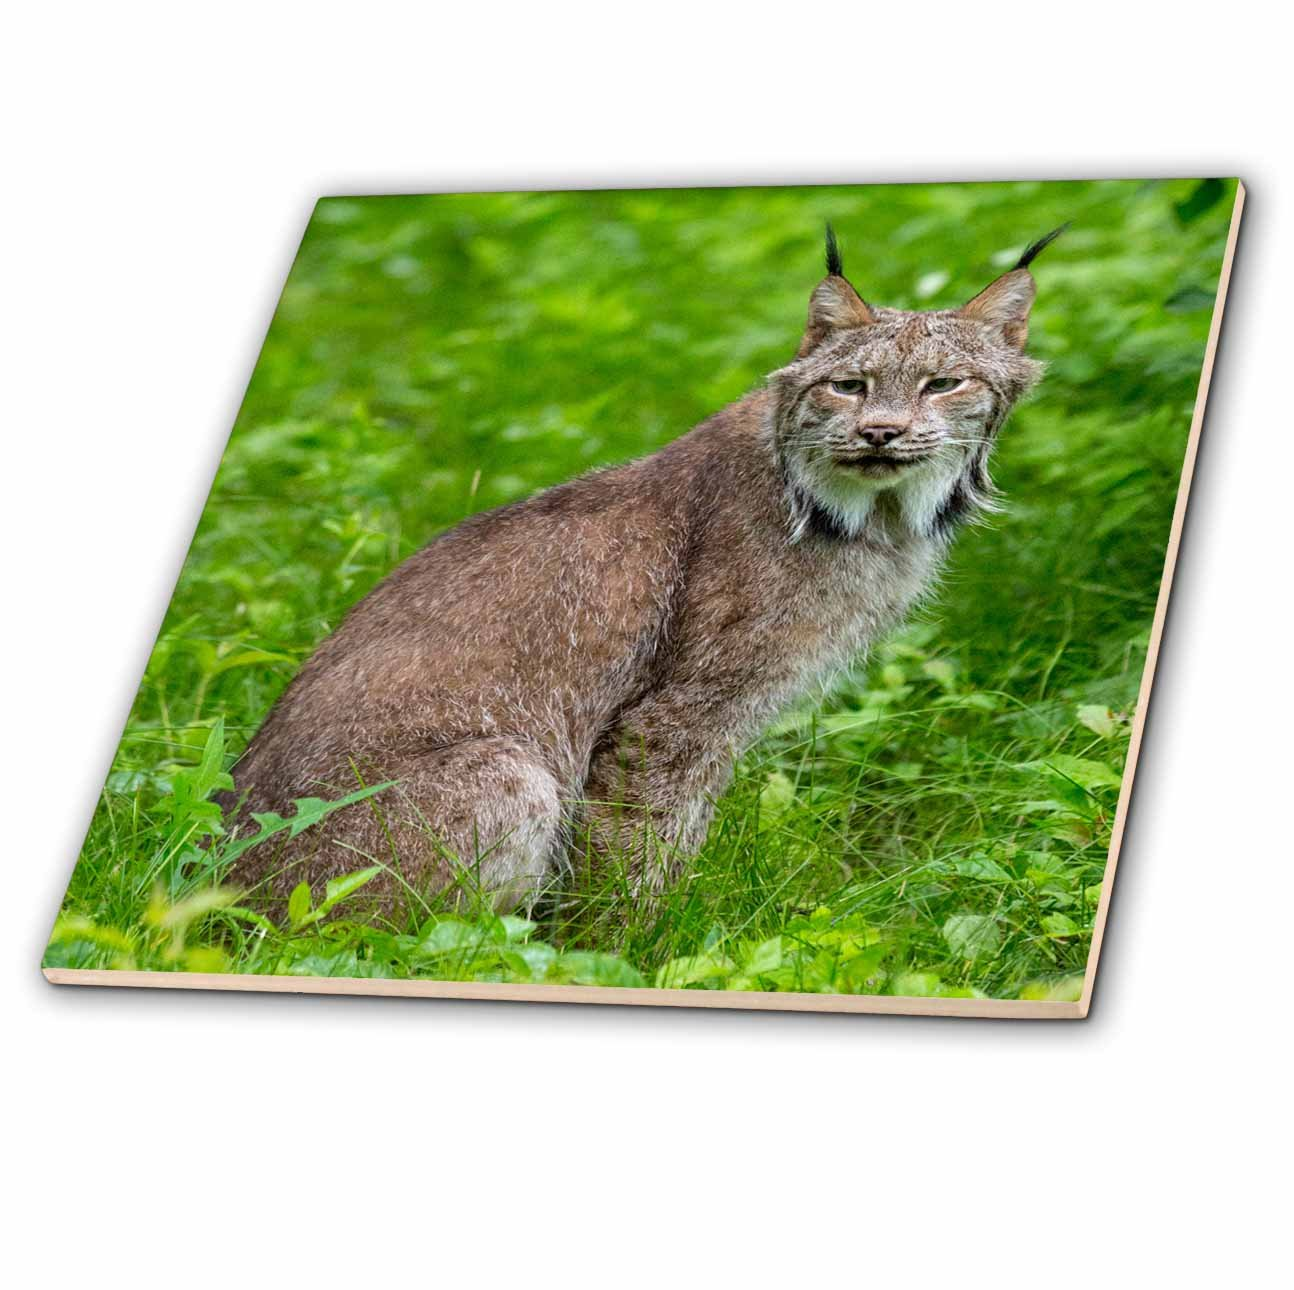 3dRose Danita Delimont - Big Cats - USA, Minnesota, Sandstone, Lynx - 6 Inch Glass Tile (ct_279134_6)